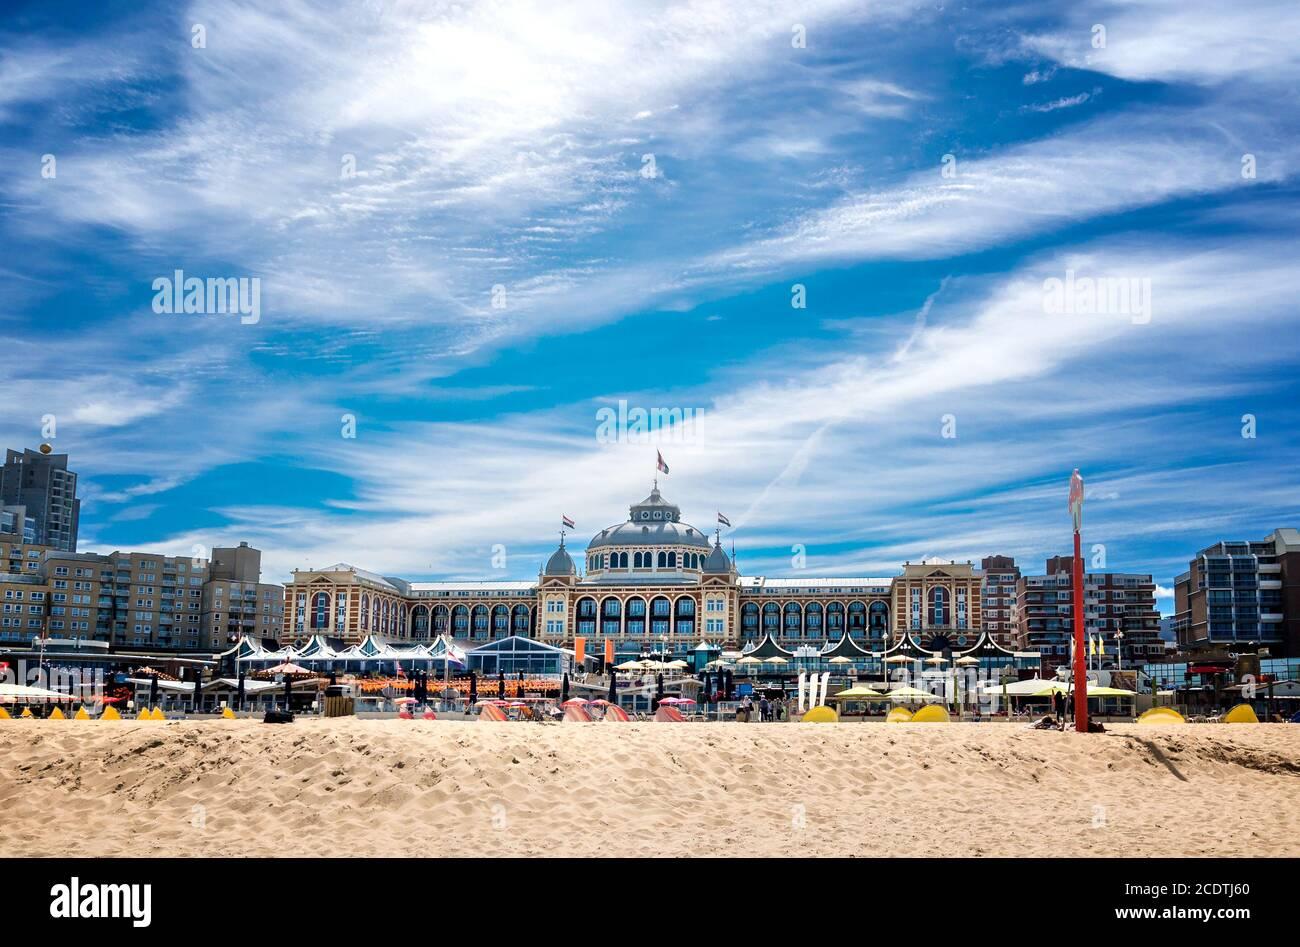 The hotel Kurhaus with beach in Scheveningen Stock Photo